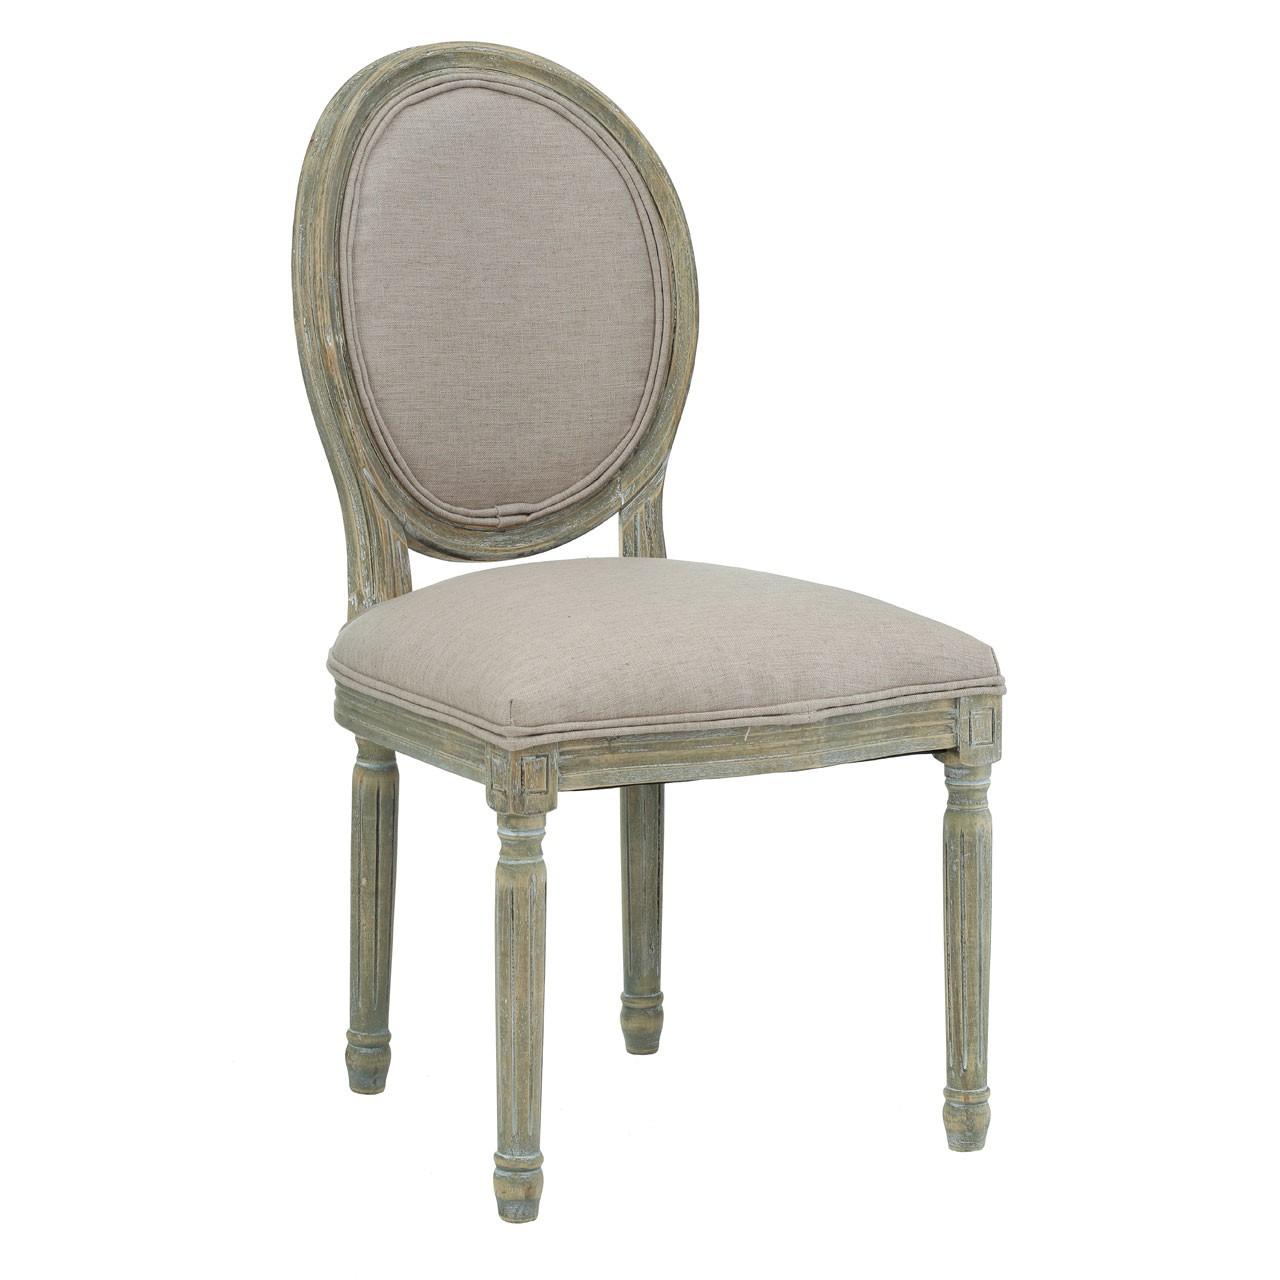 Francois Chair - Grey, Green, Natural and Cream (Colour: Natural)